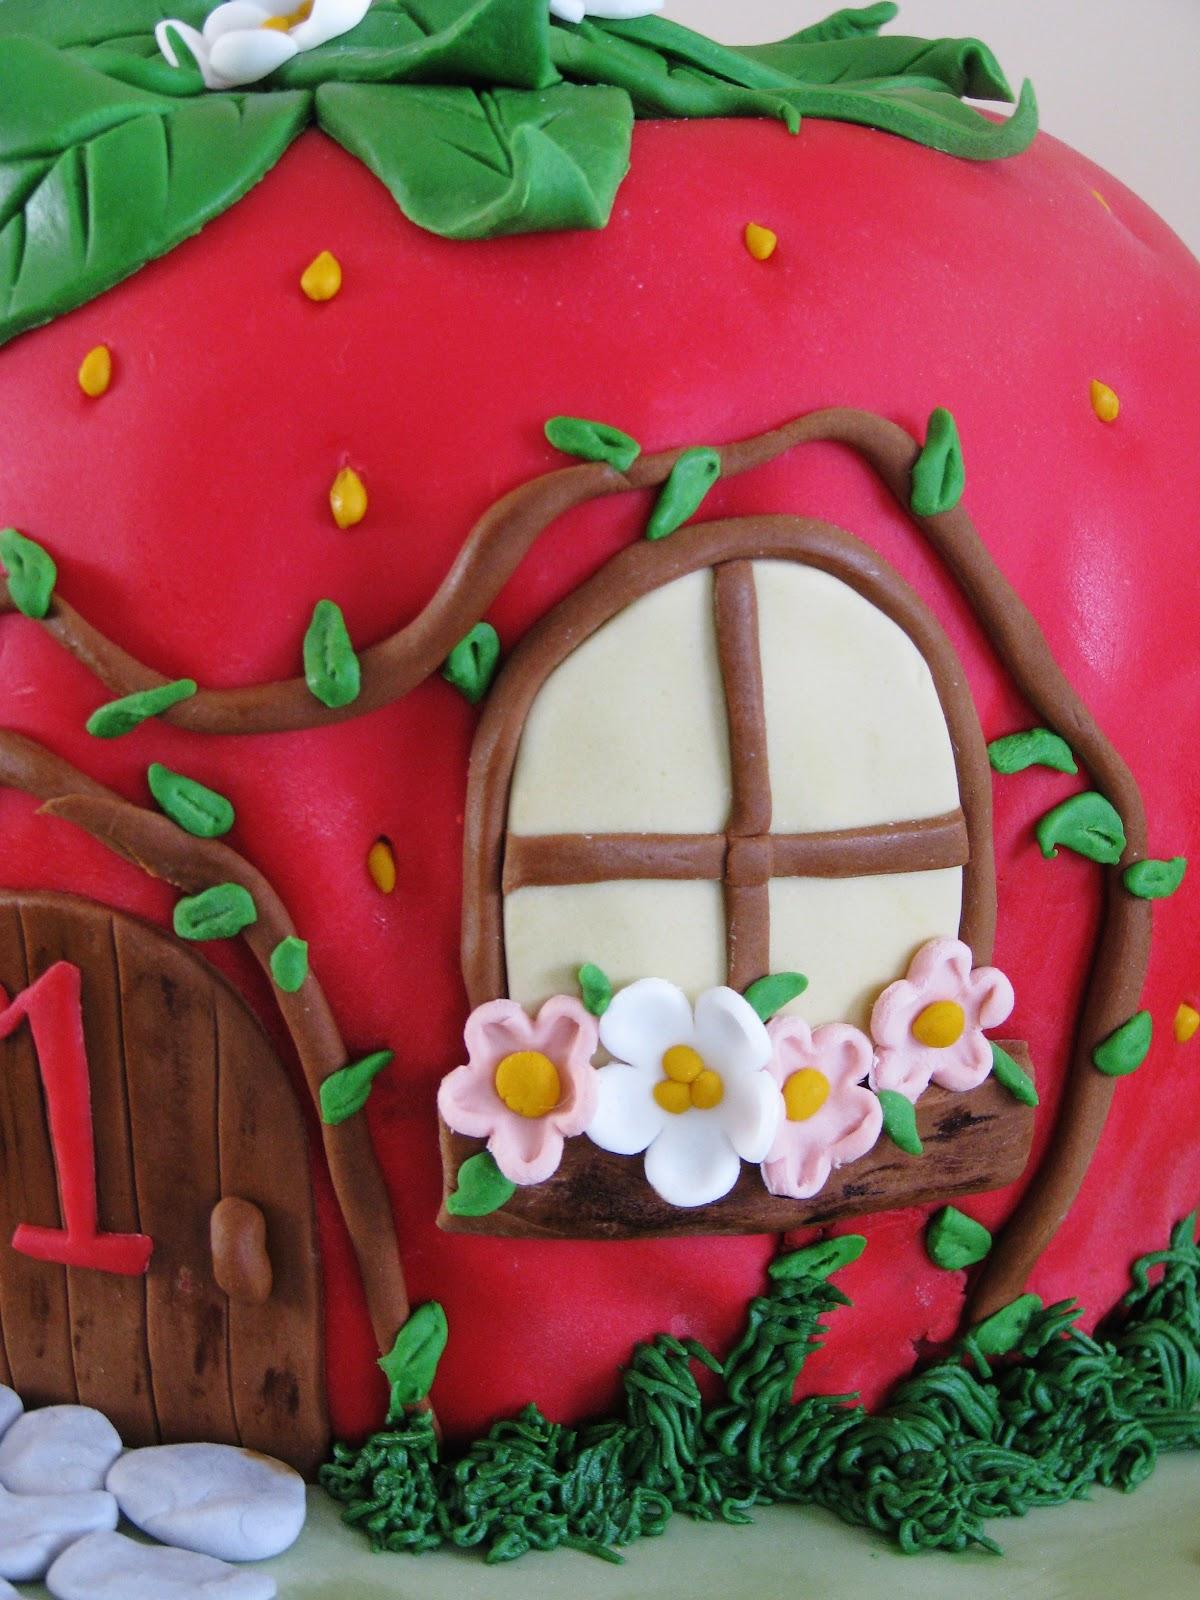 Bliss Cakes Of London Strawberry Shortcake House